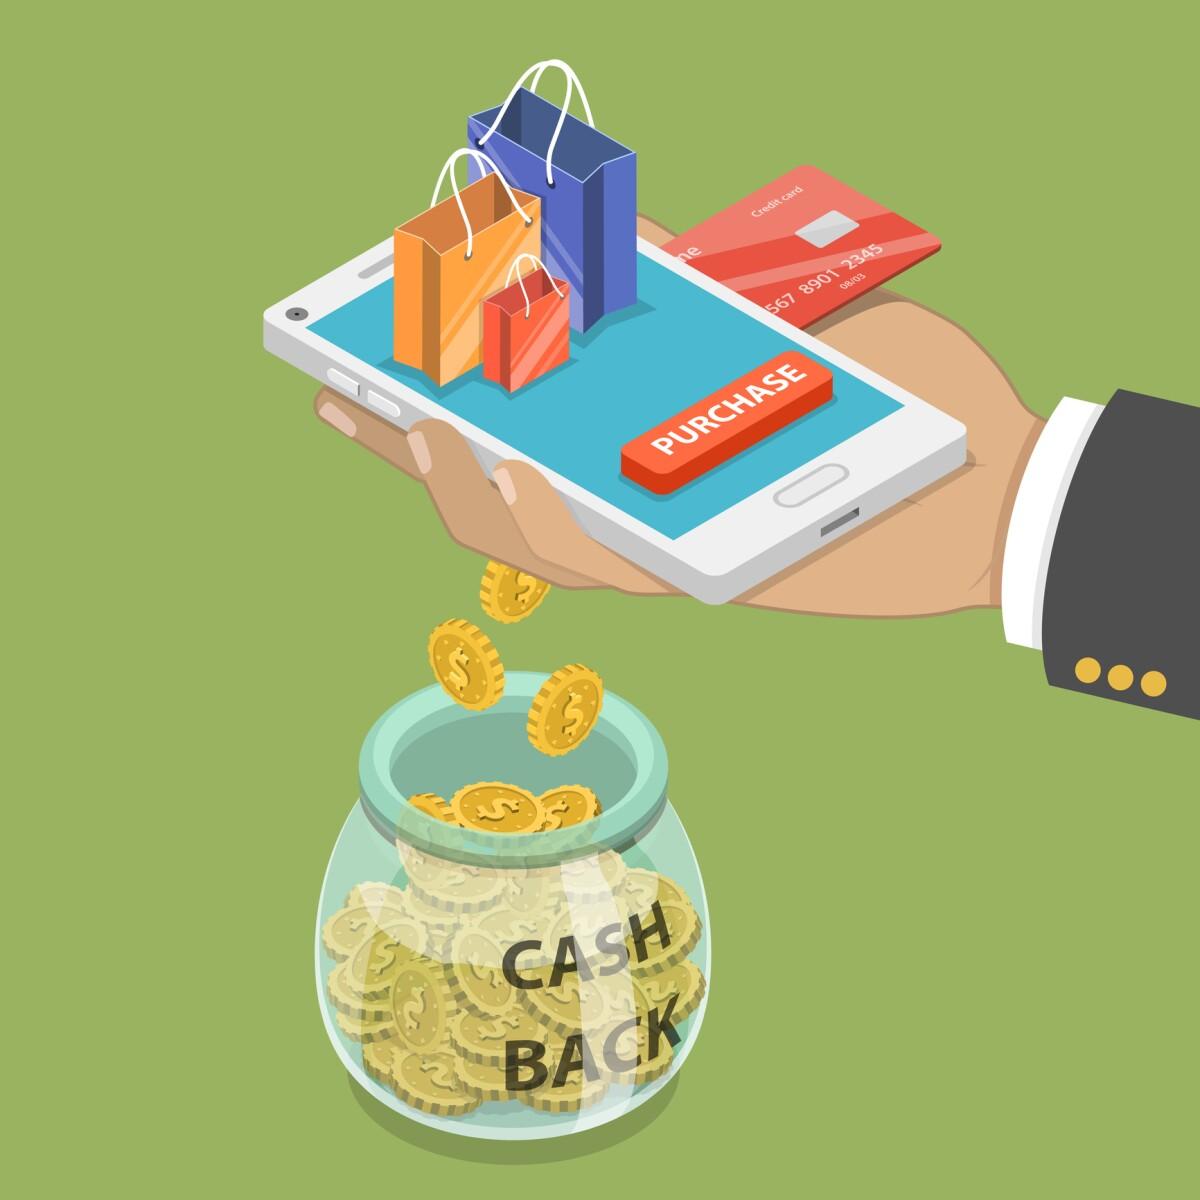 Temblar bancos; Mercado Libre lanzará créditos para consumidores finales en México